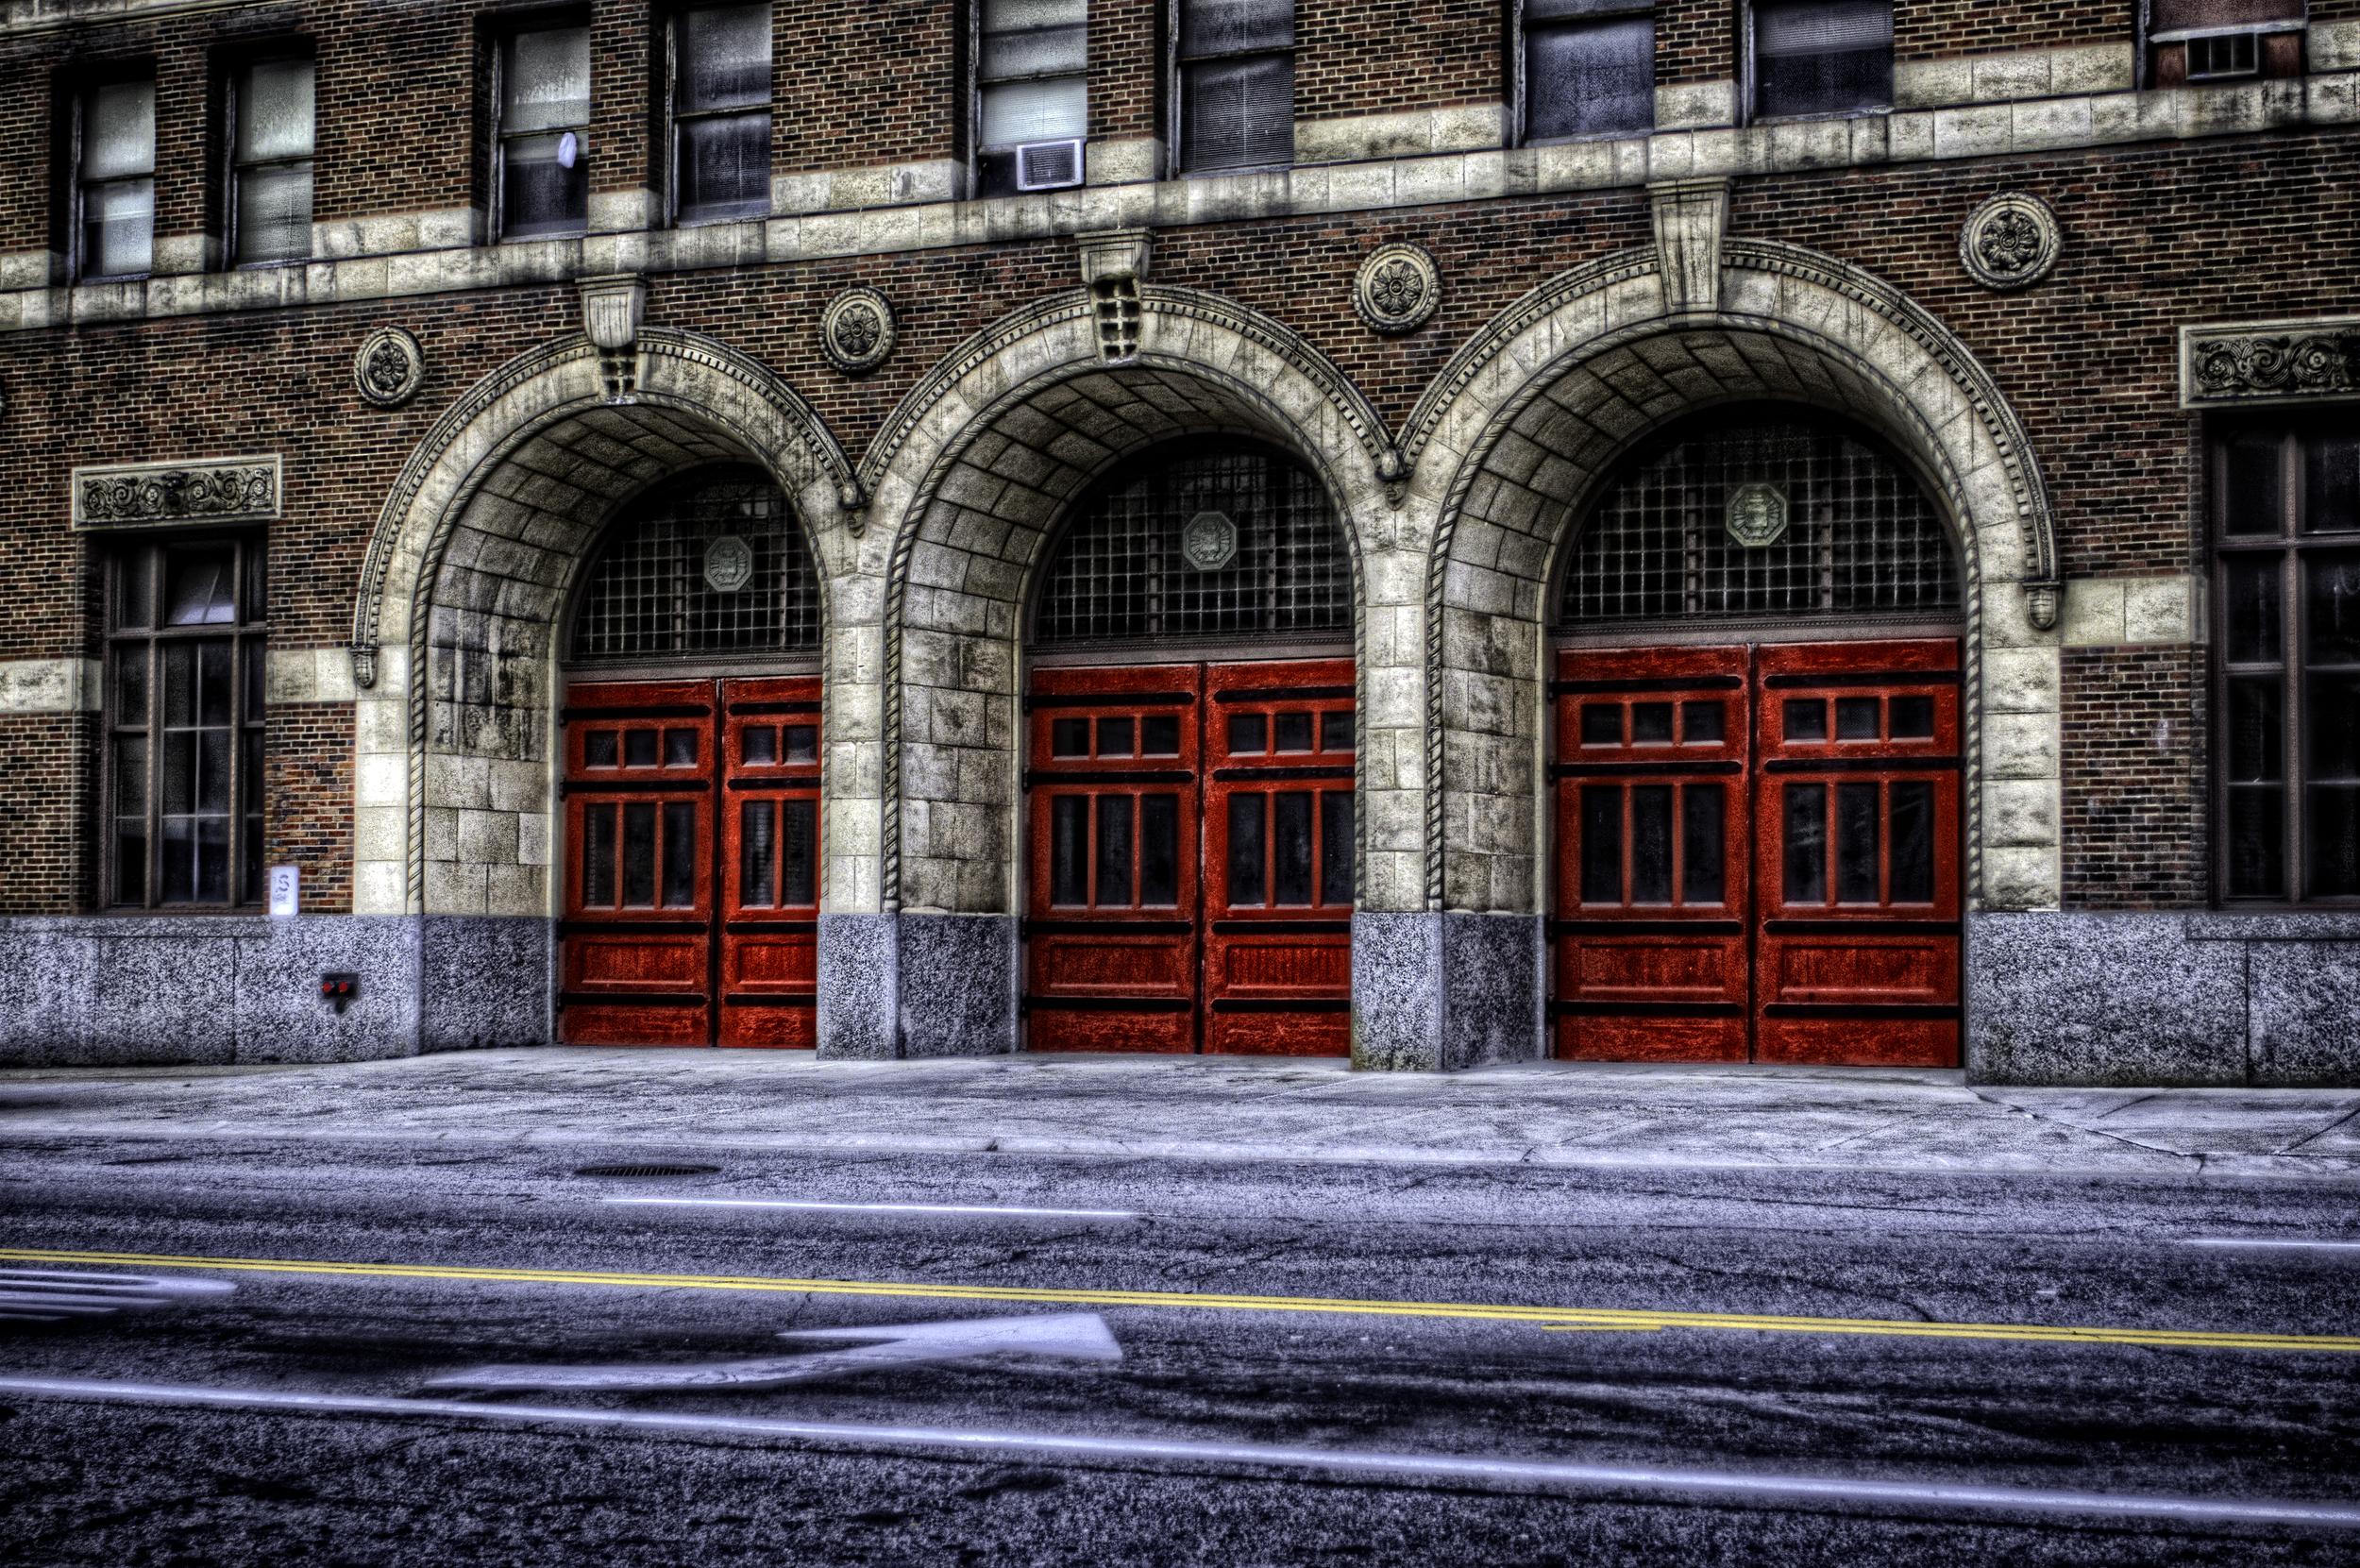 Detroit Fire Station